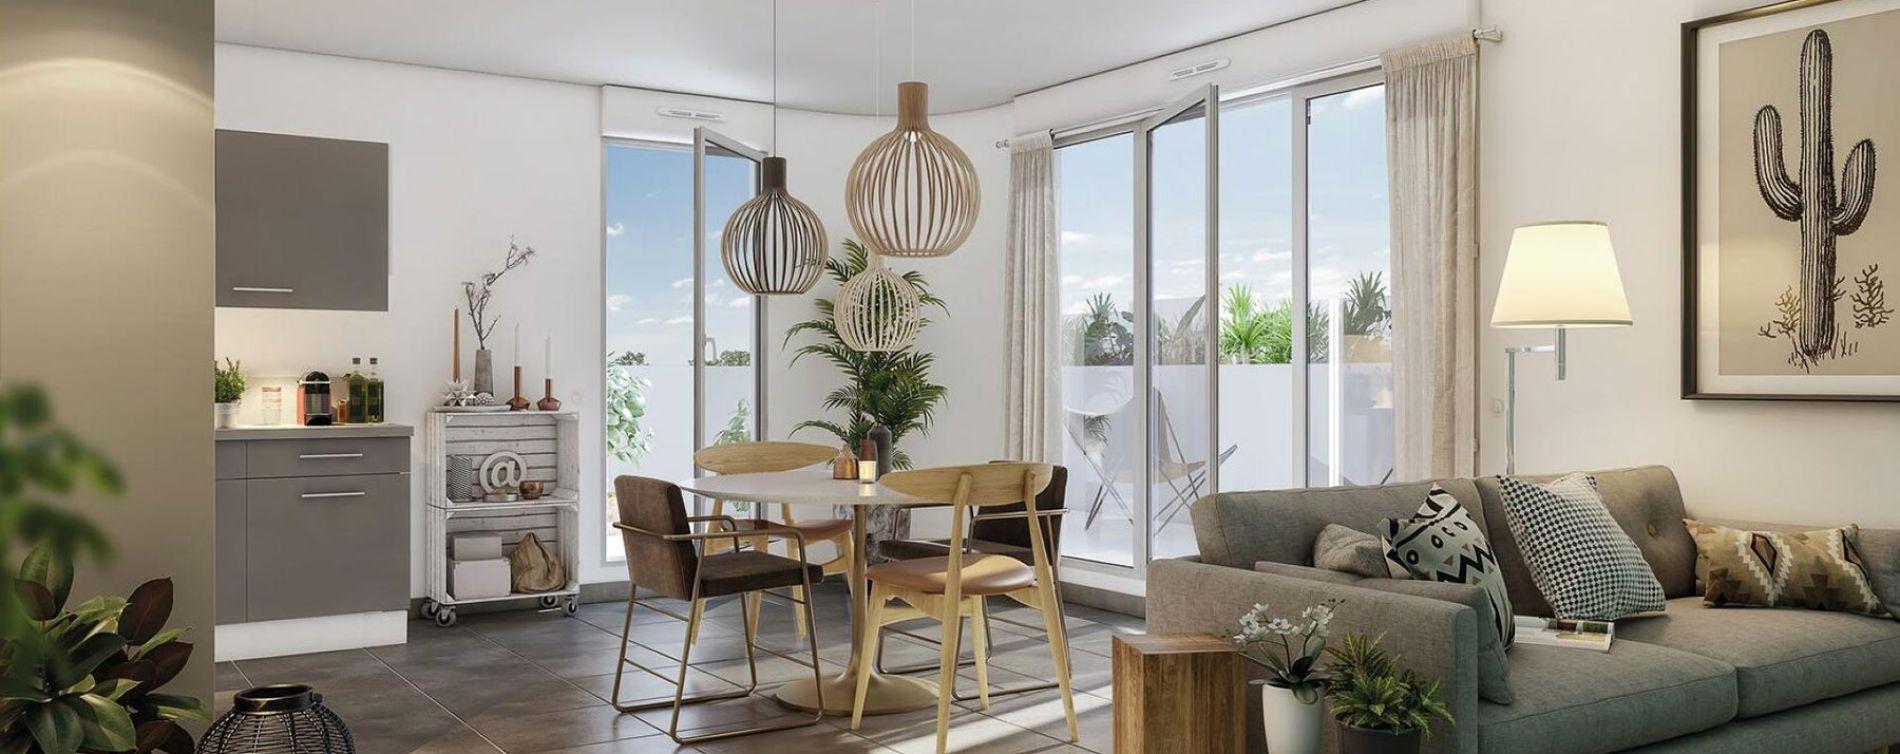 Montpellier : programme immobilier neuve « Programme immobilier n°218850 » en Loi Pinel (3)